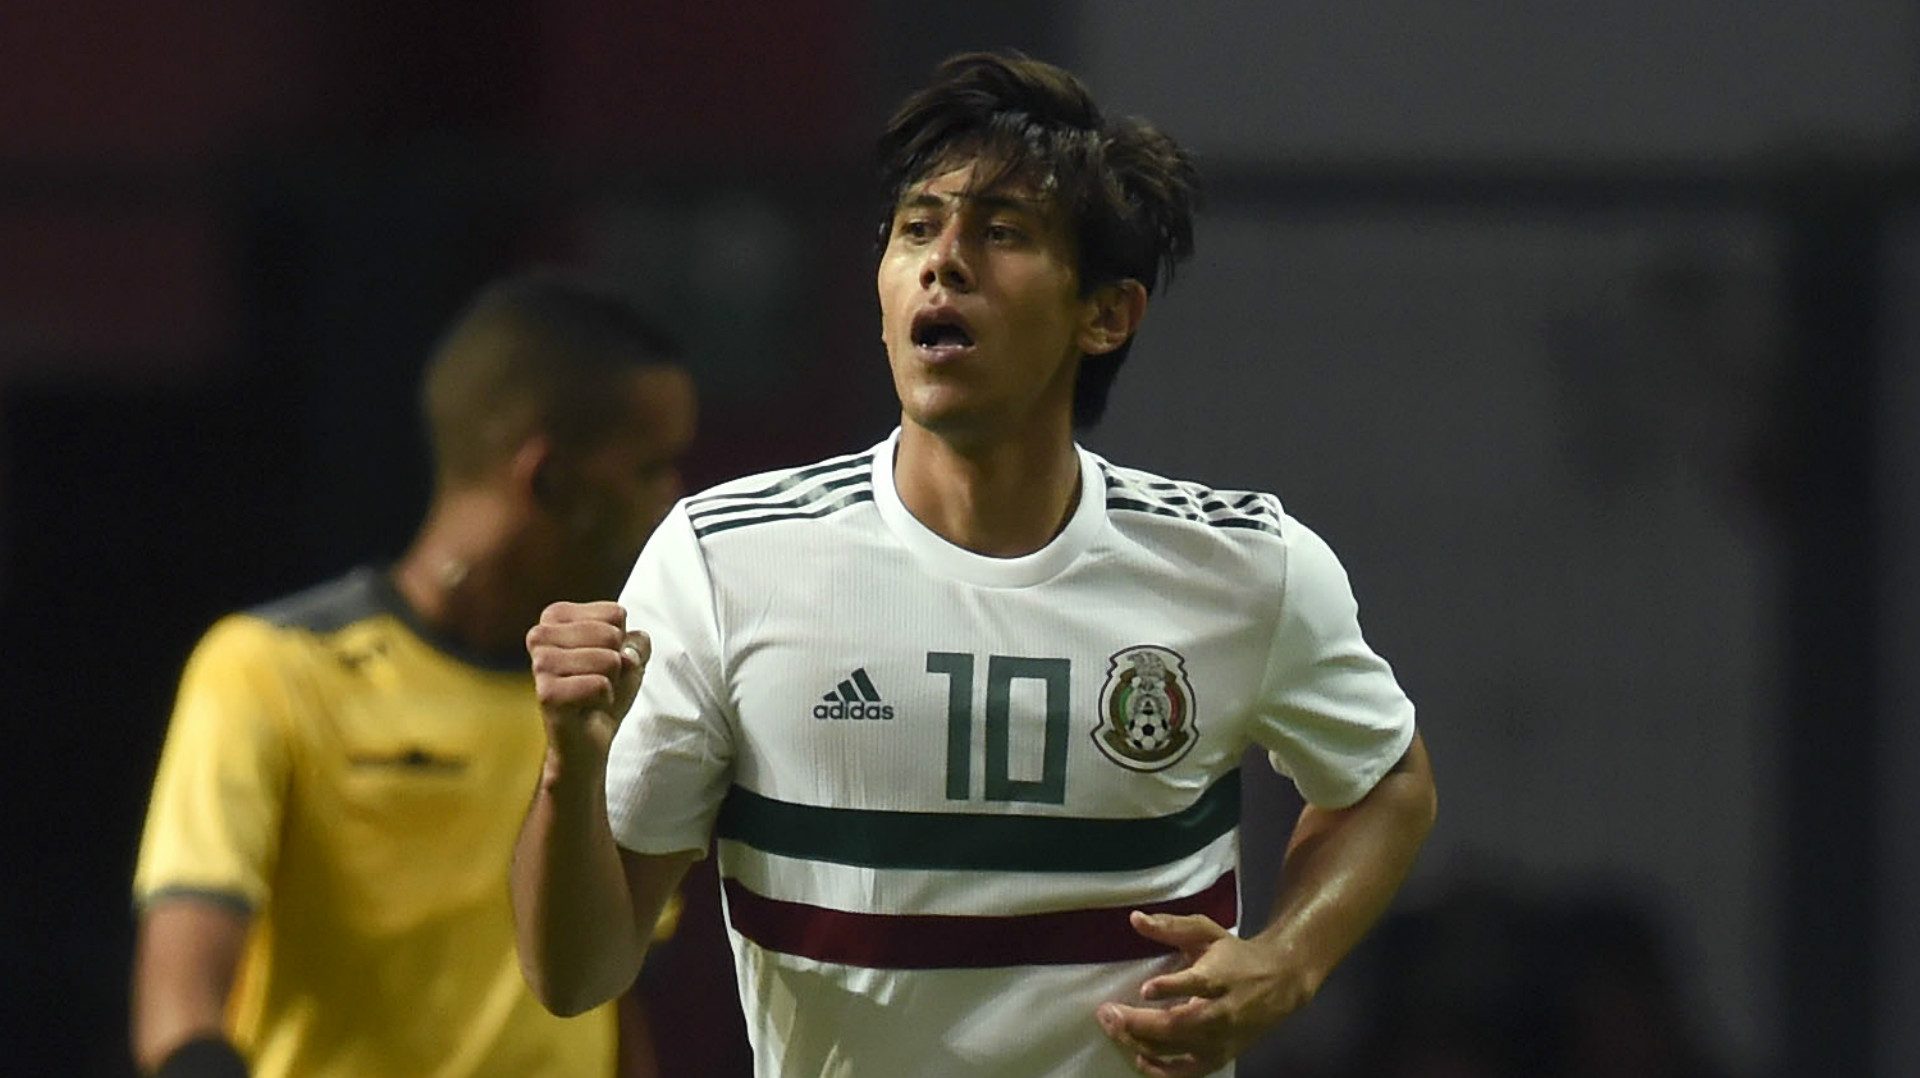 'Why should I move? - Getafe's Macias explains why few Mexican stars are leaving Liga MX for Europe